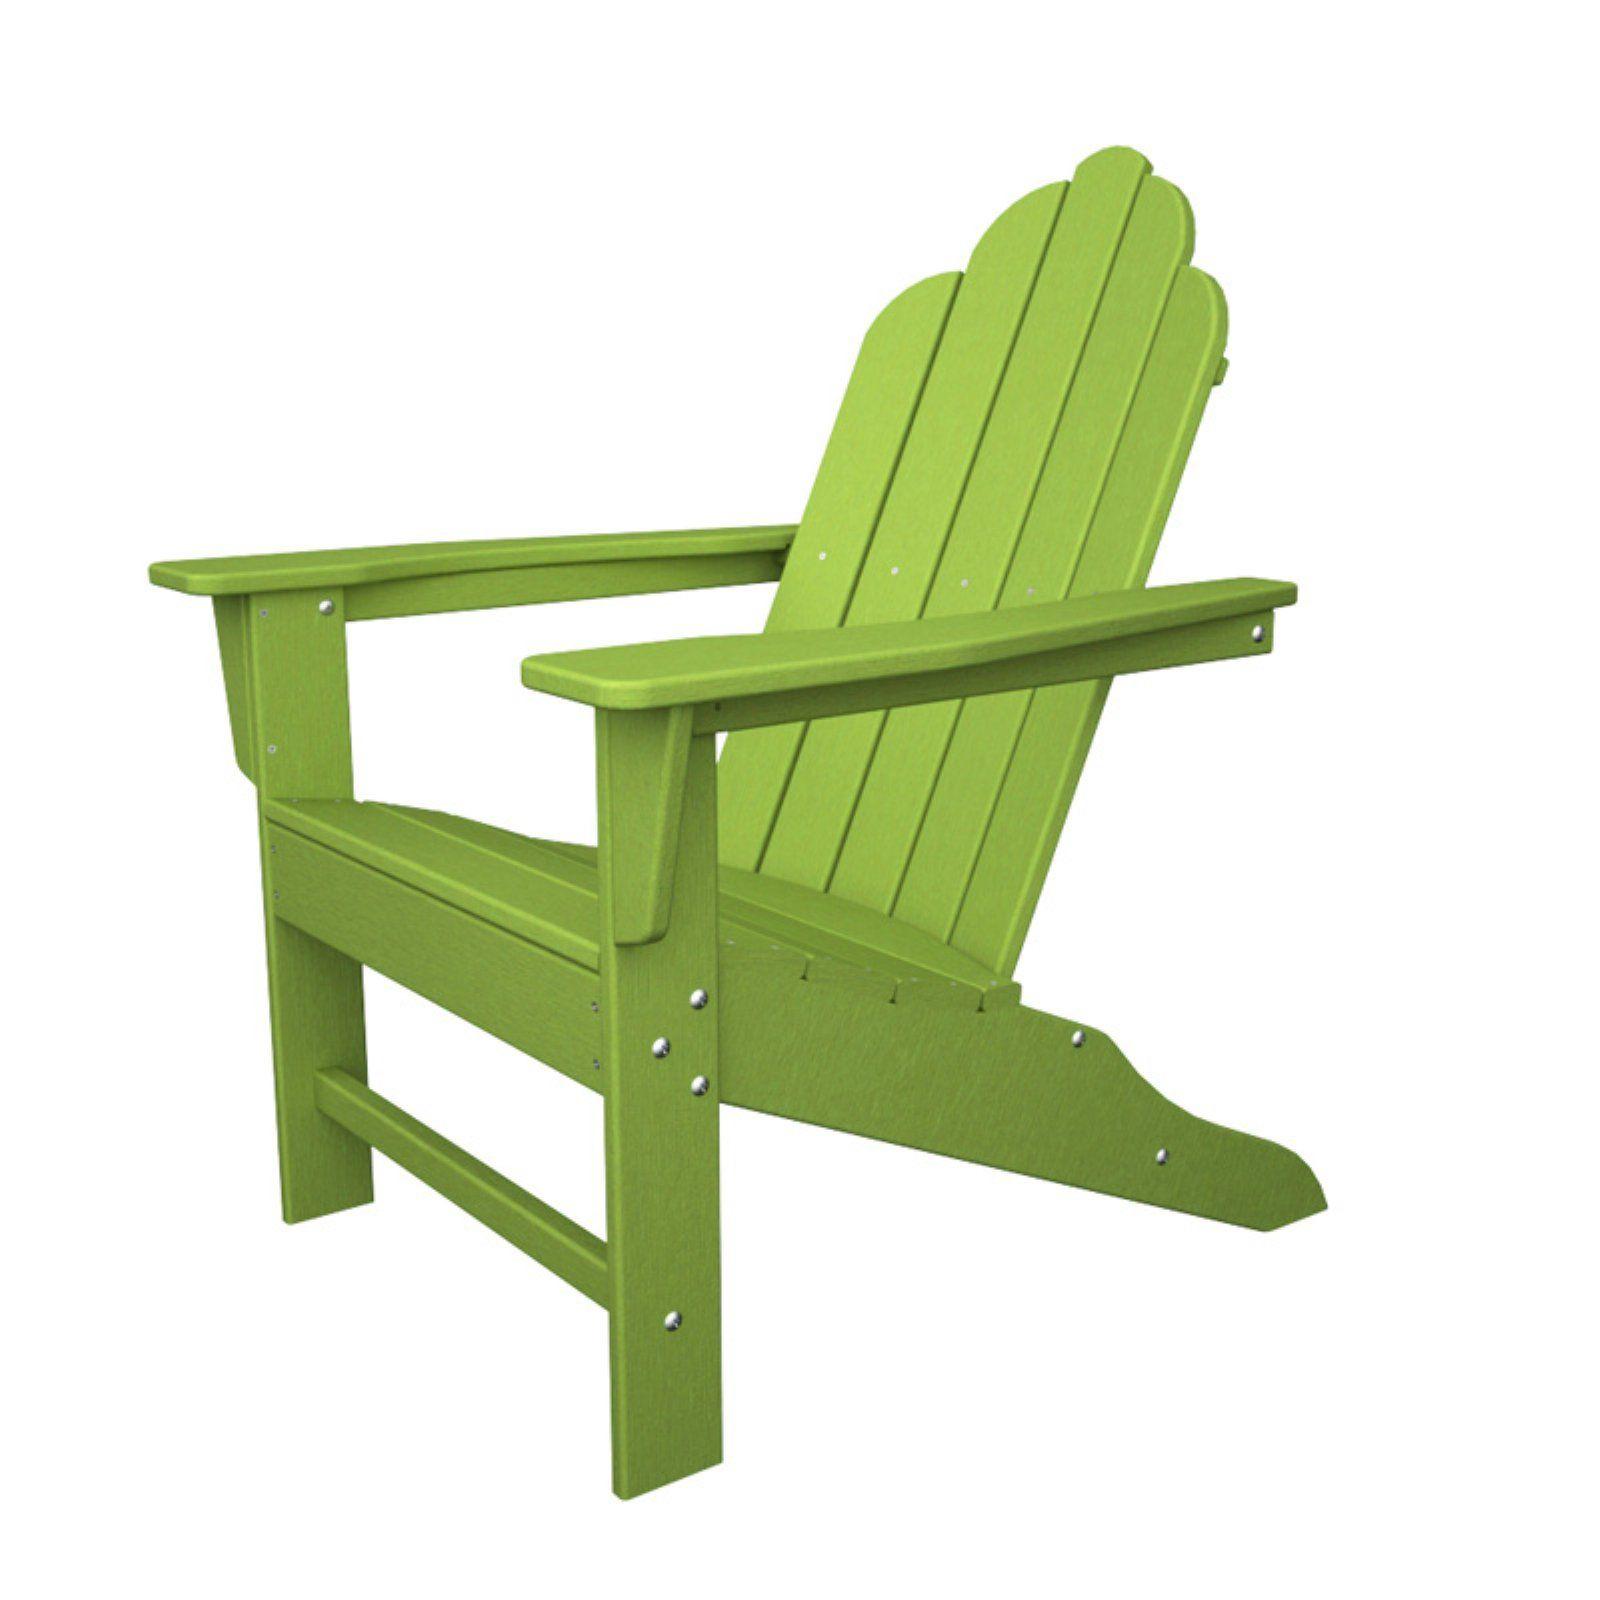 Outdoor Polywooda Long Island Recycled Plastic Adirondack Chair